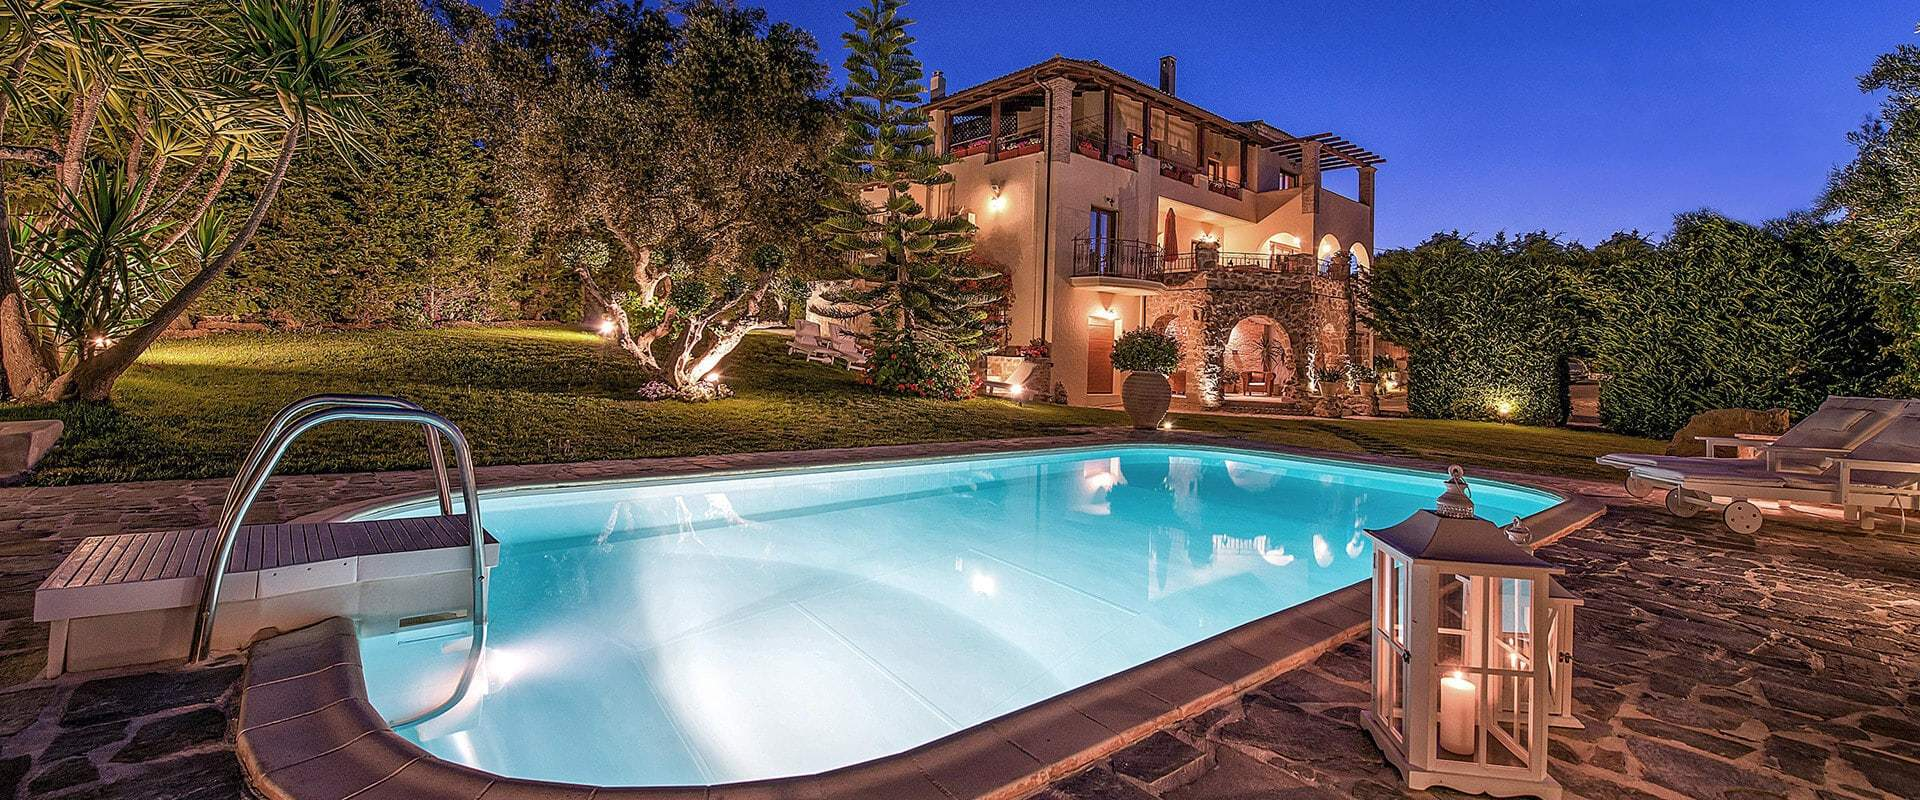 Cayman Islands Luxury Properties For Sale